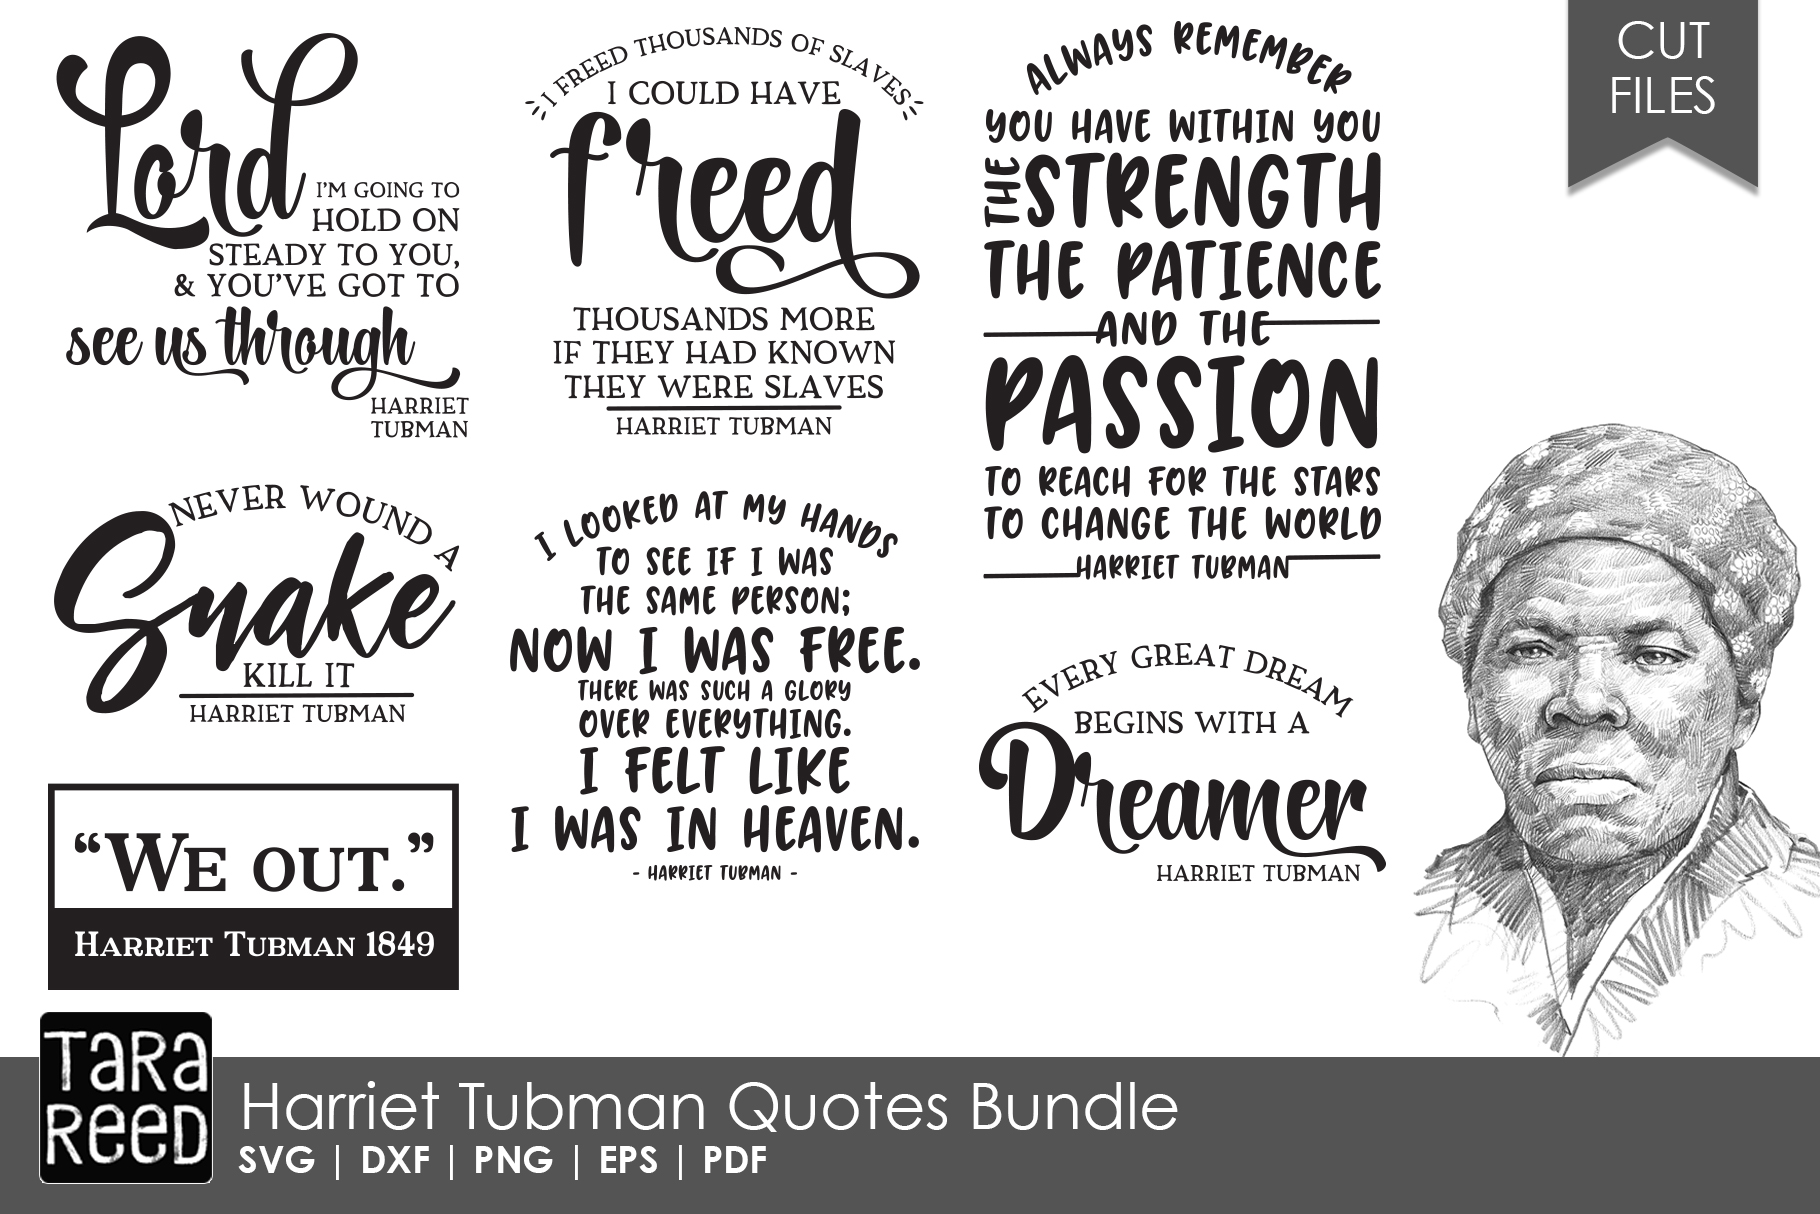 Harriet Tubman Quotes Bundle